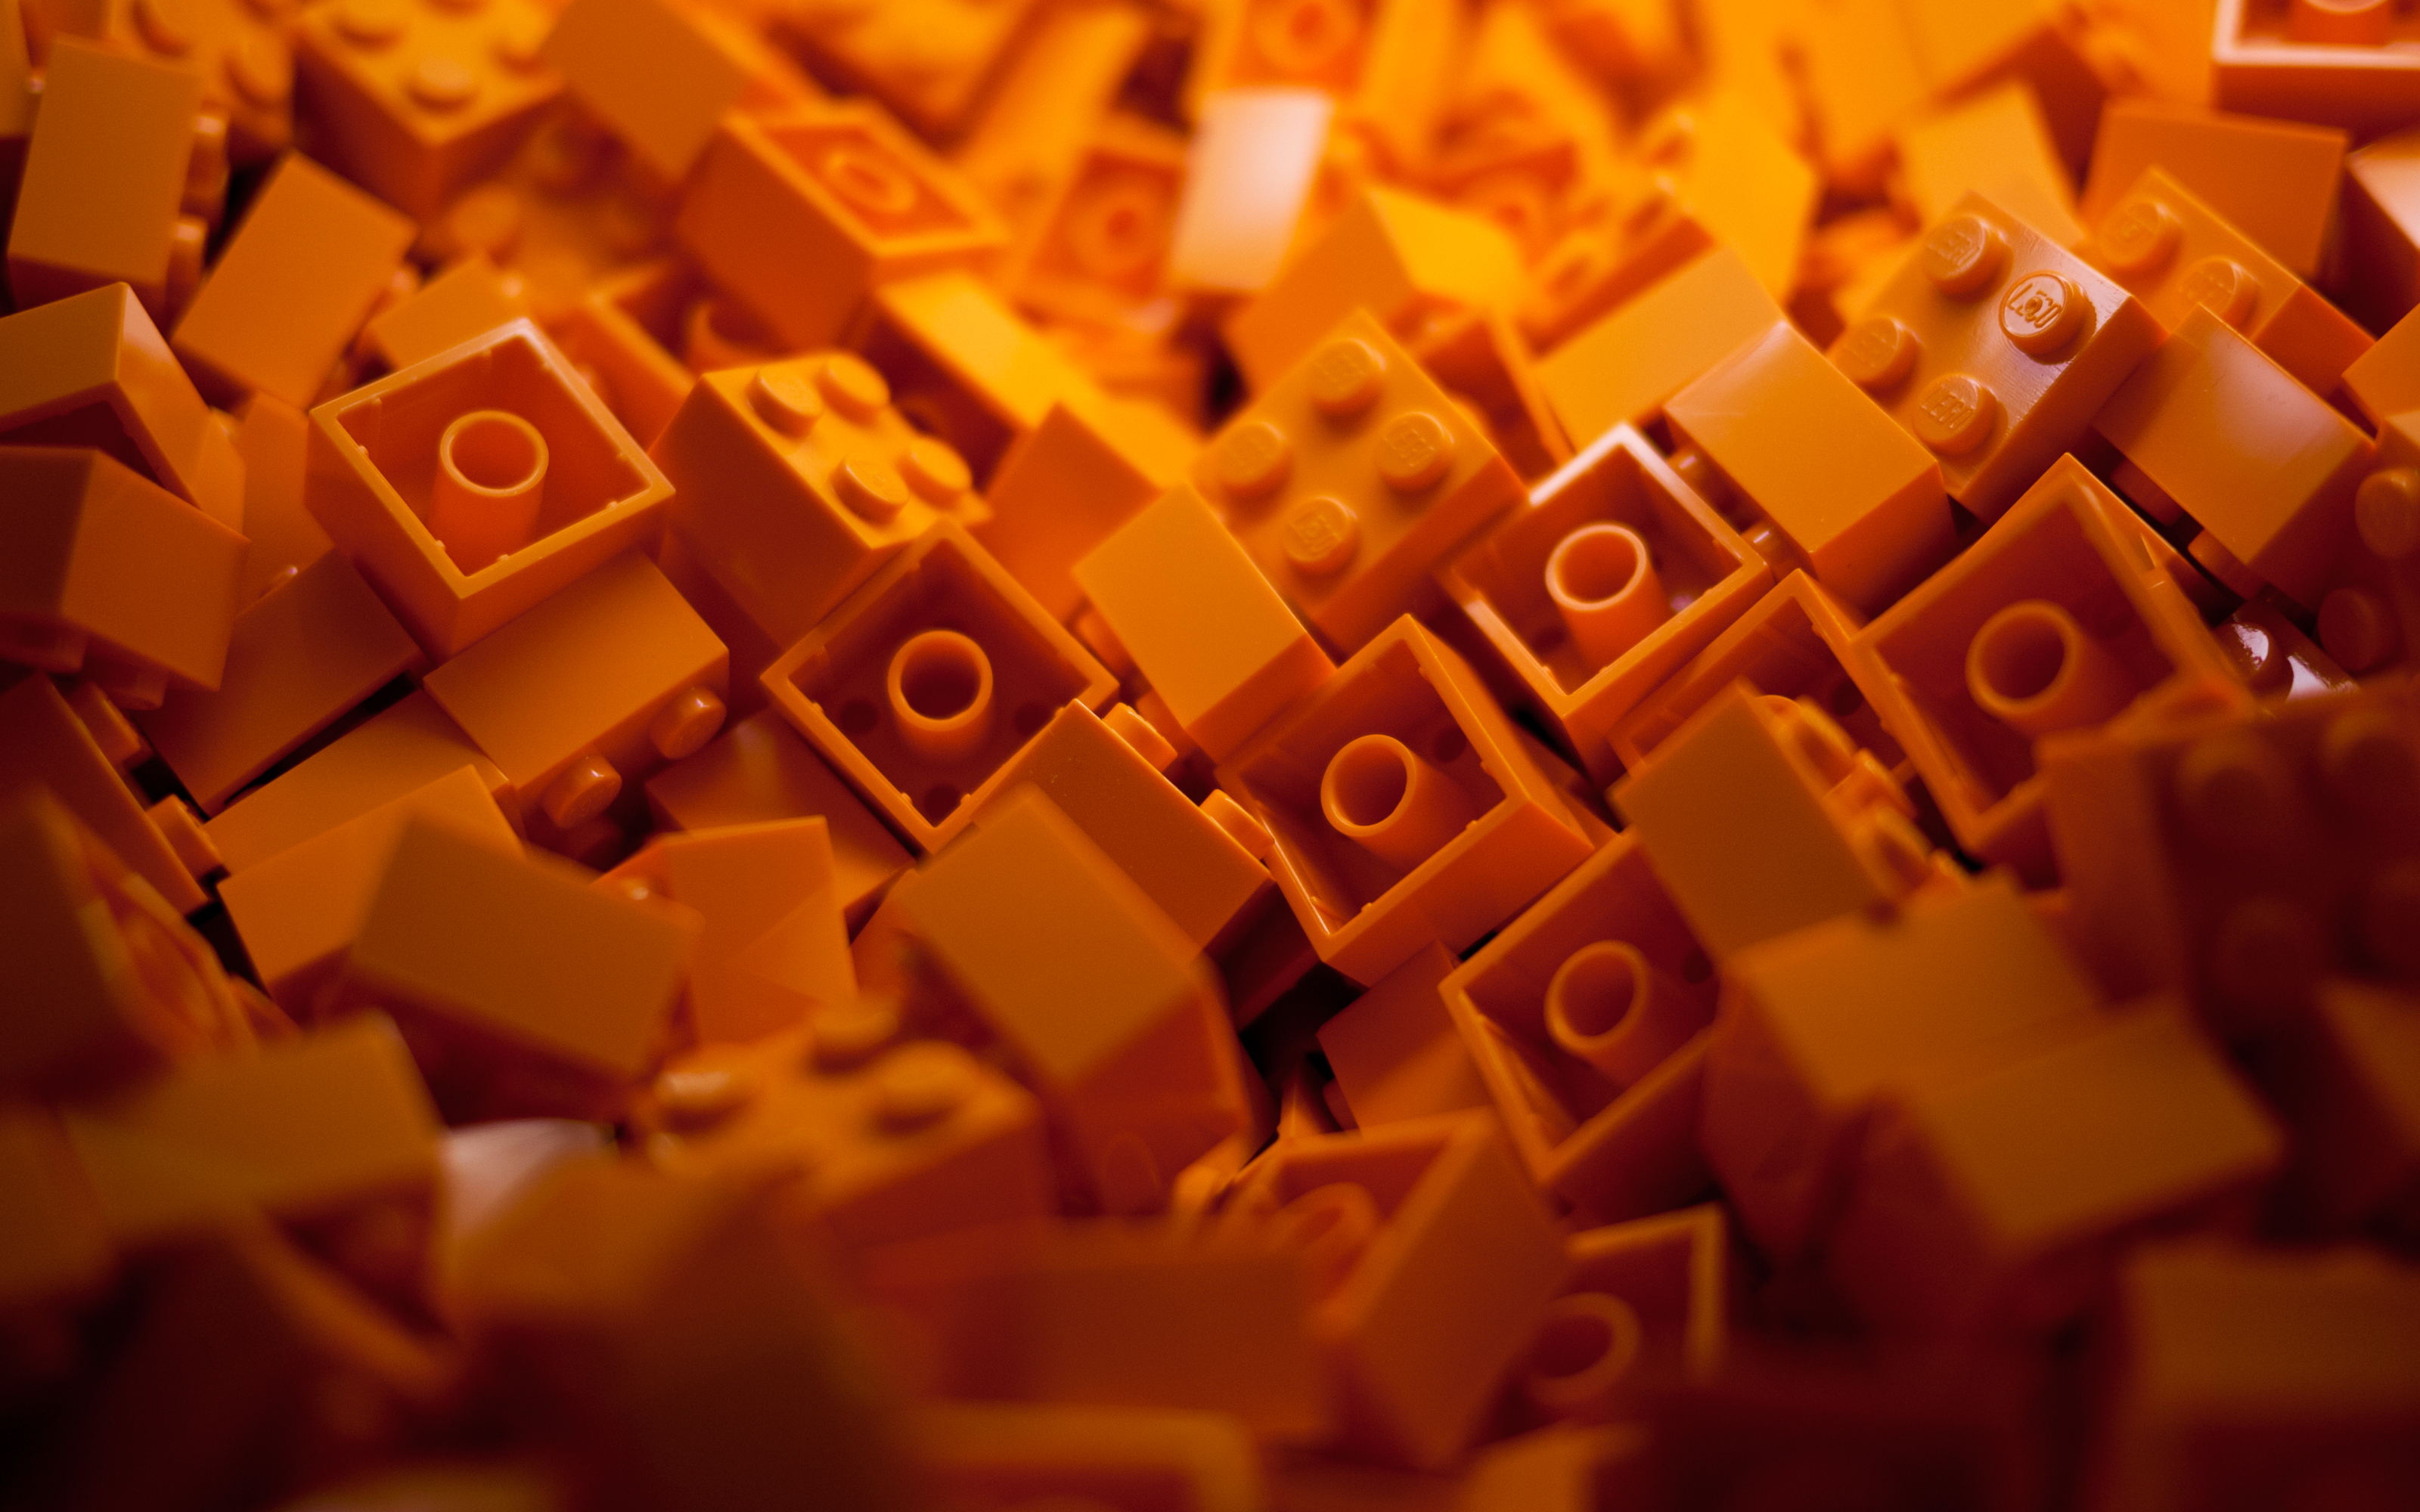 Orange Lego Bricks Orange bricks   desktopjpg 3200x2000